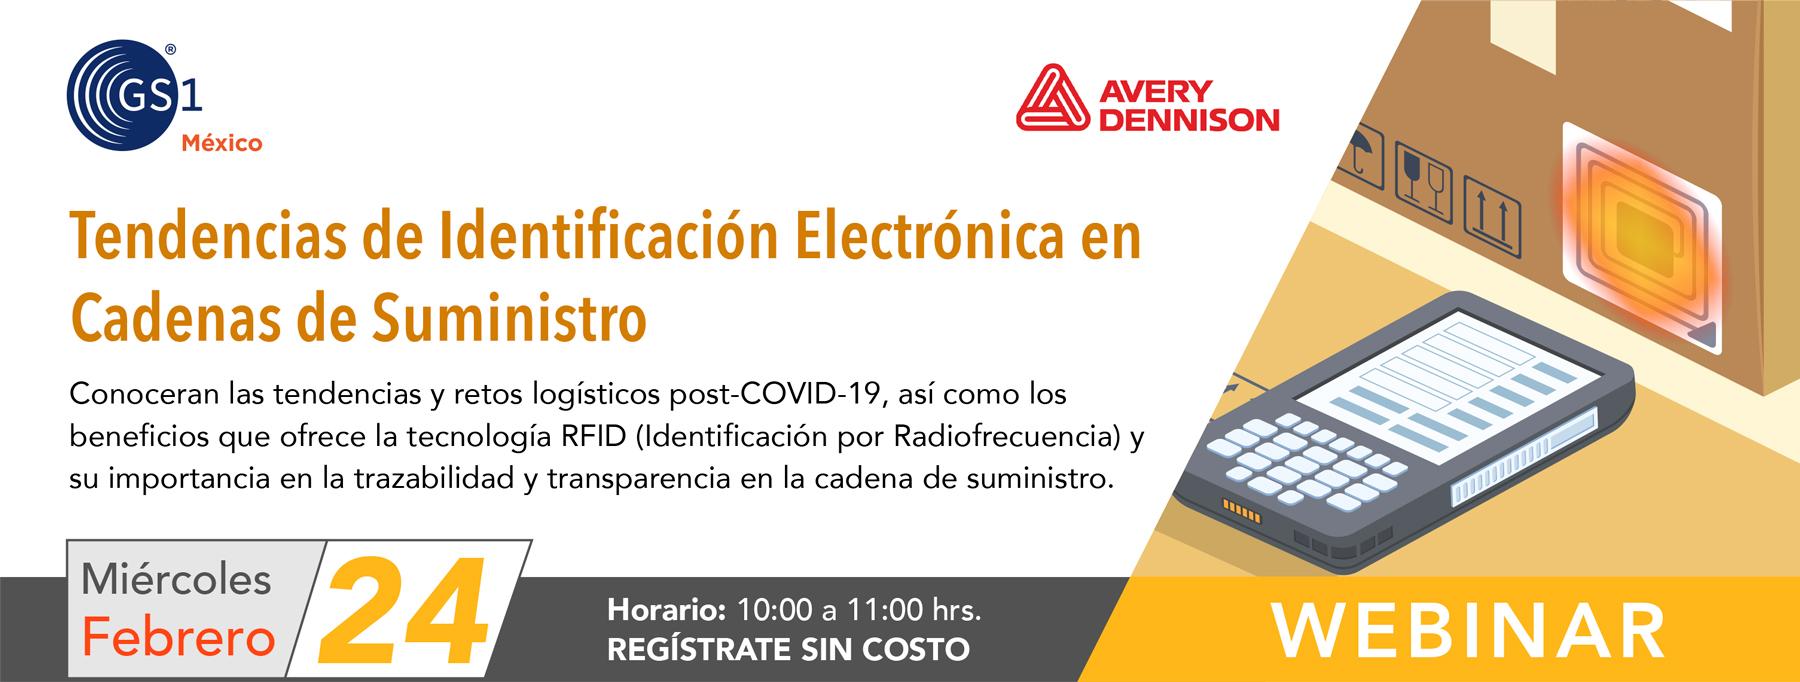 Identificacion-Electronica-1